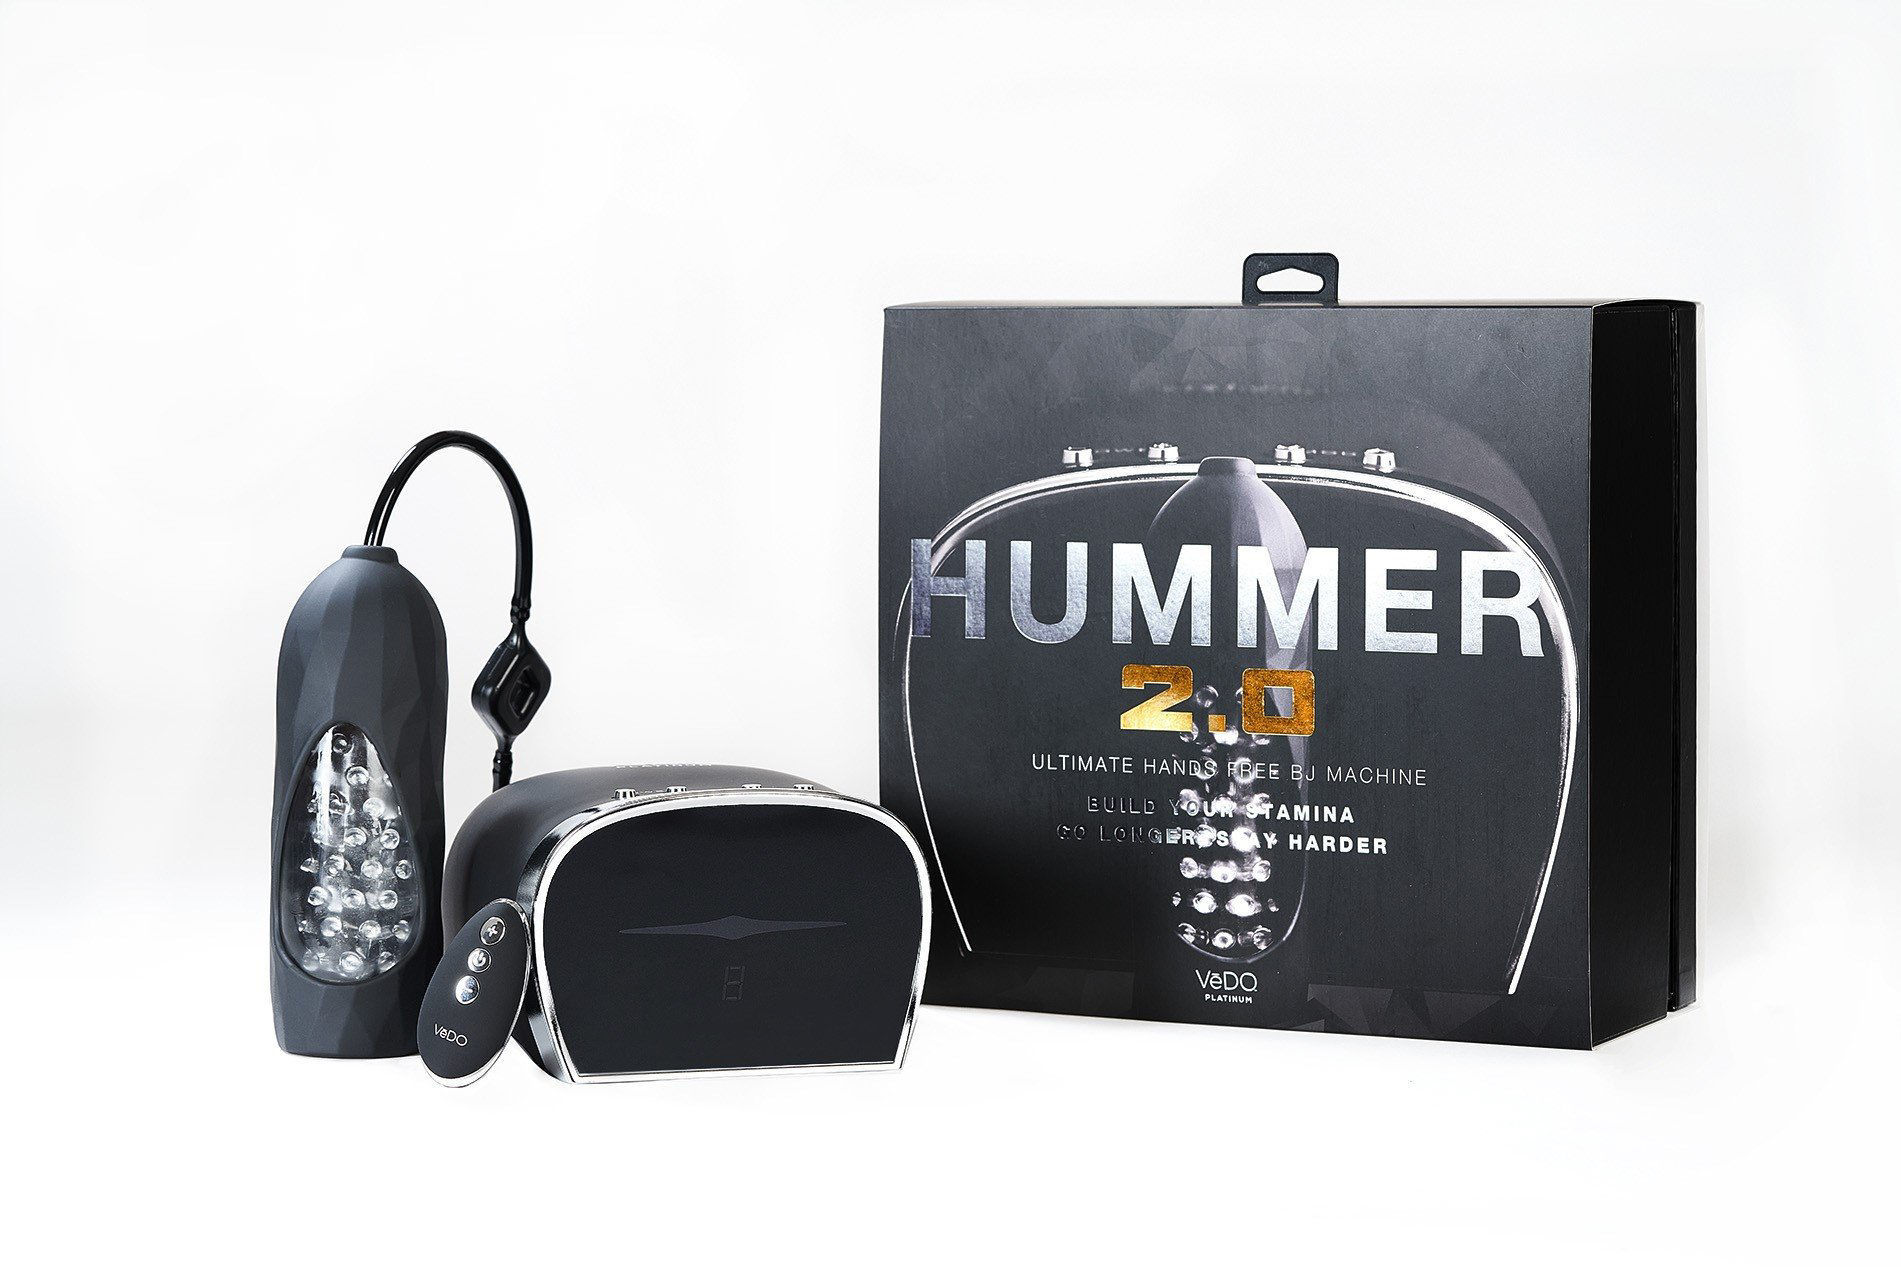 Image de Hummer 2.0 – The Ultimate BJ Machine